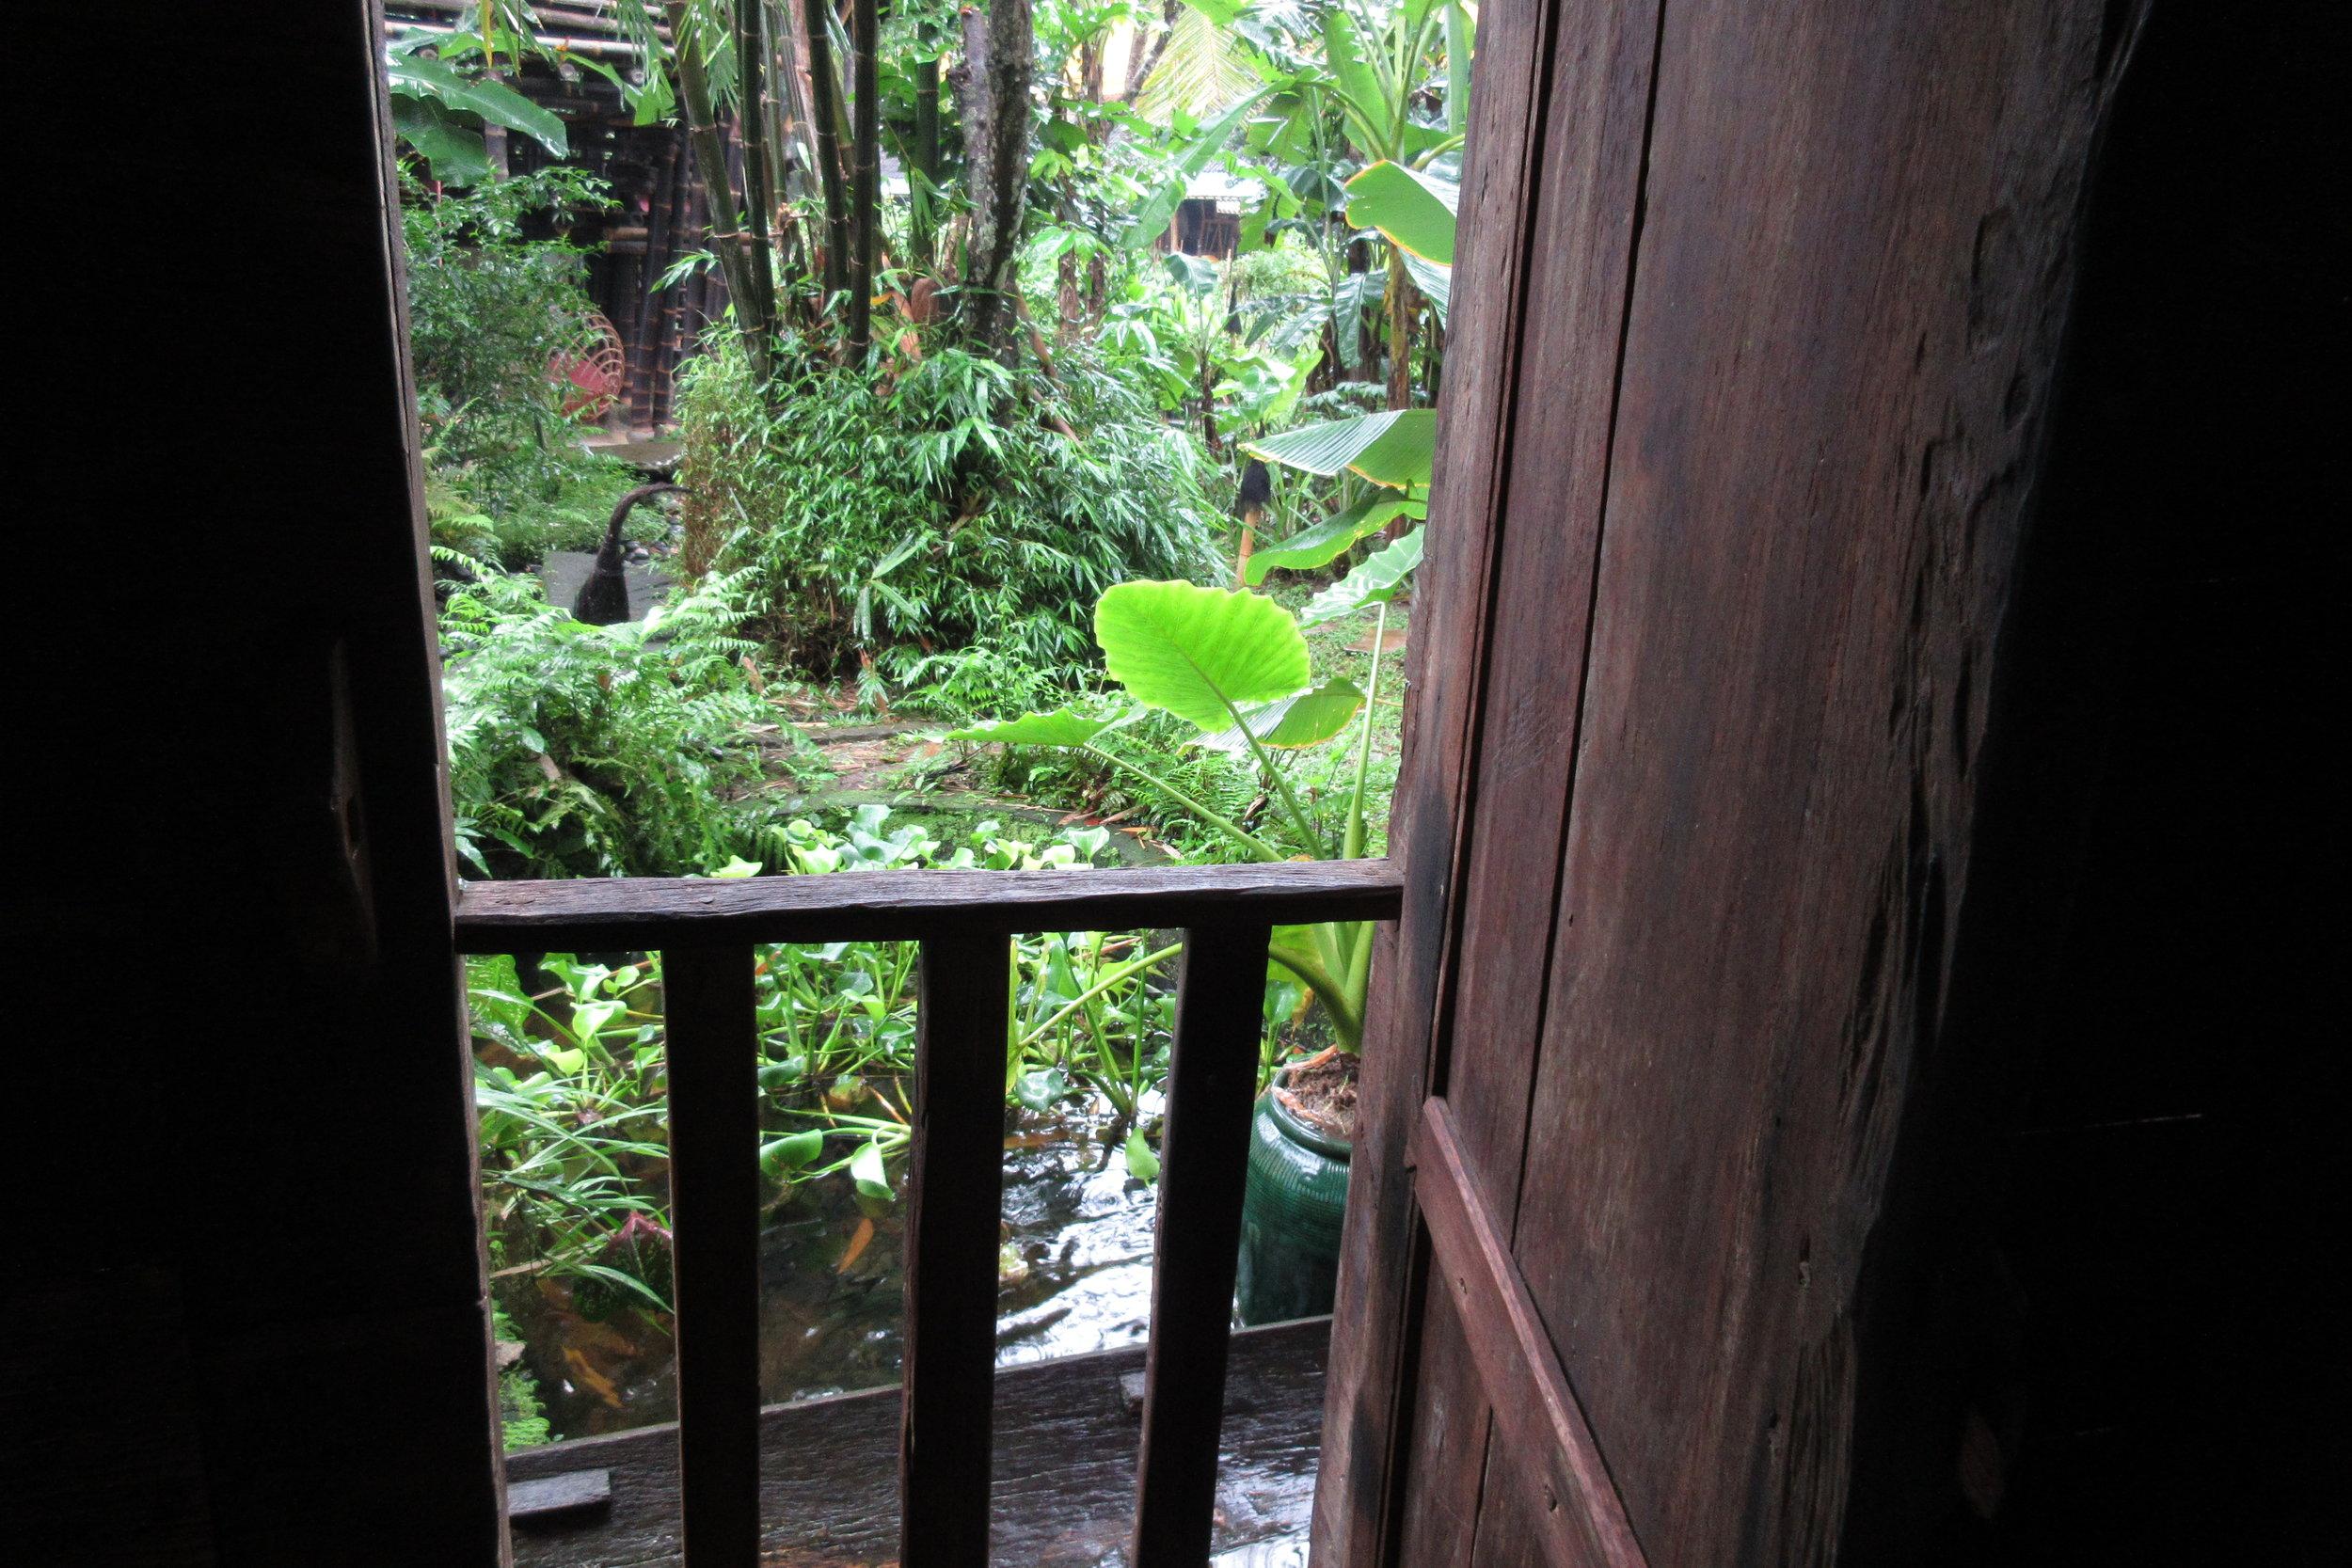 Bambu Indah Ubud – Udang House balcony